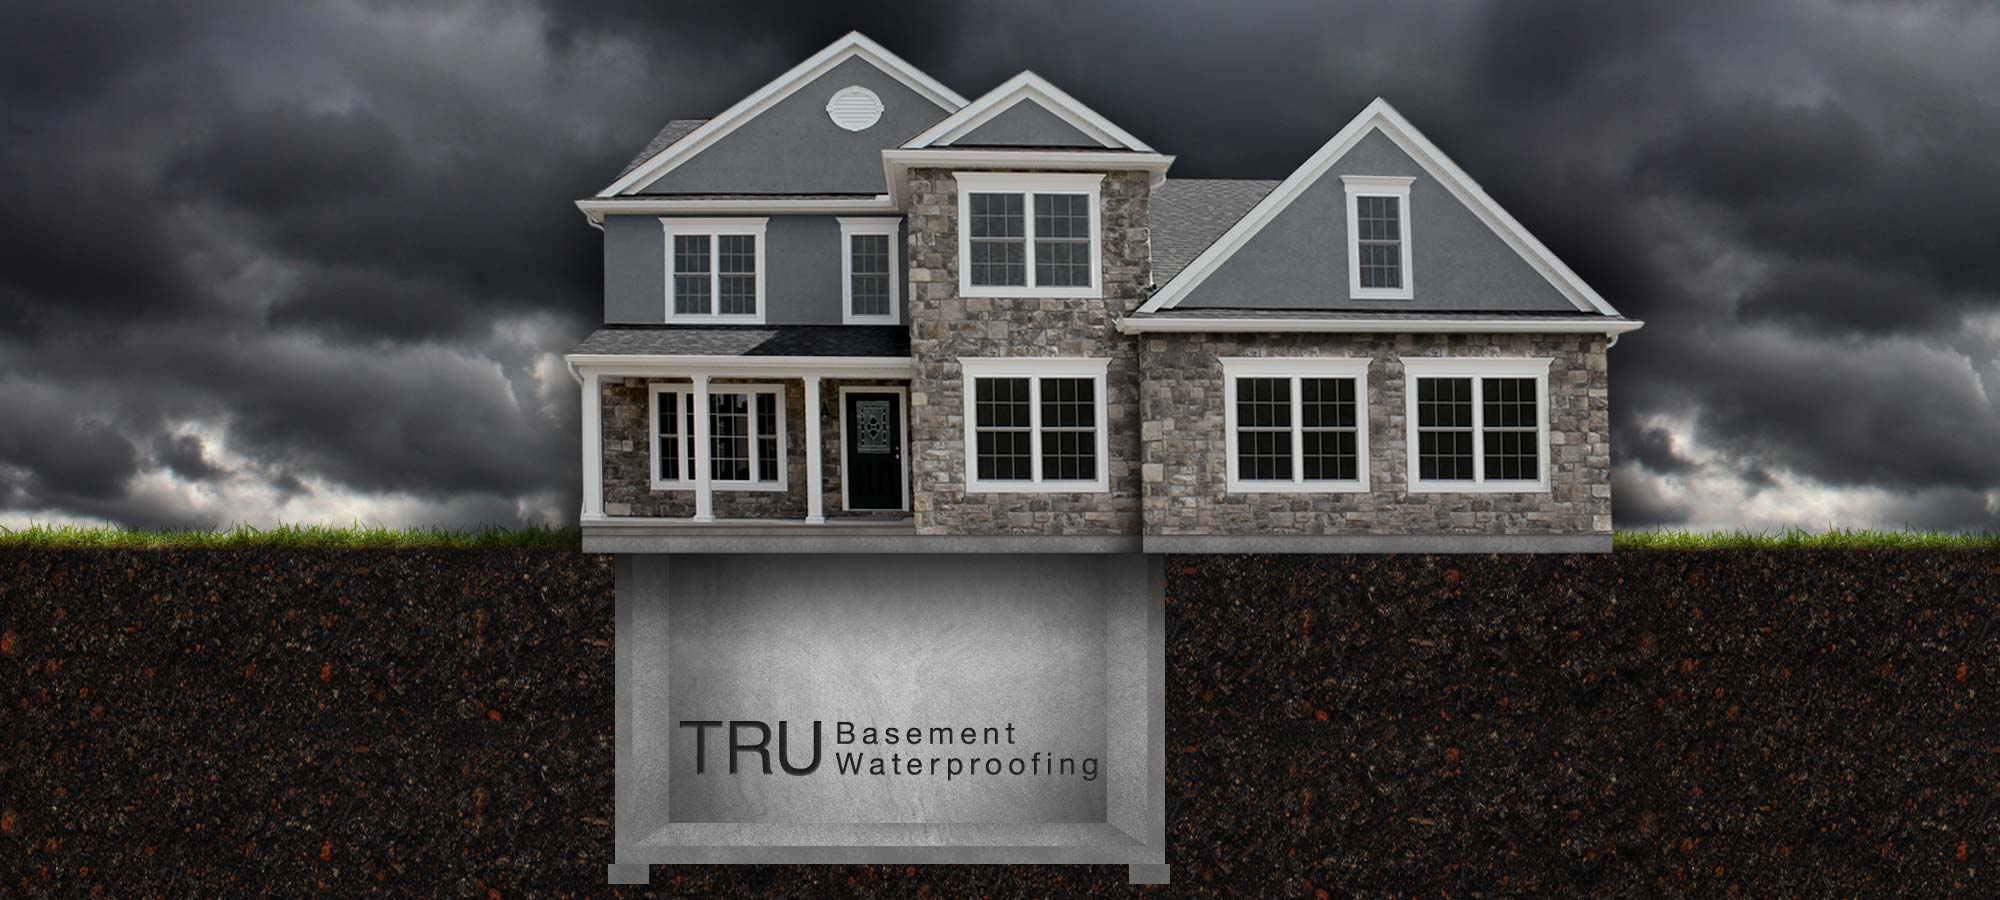 Tru Basement Waterproofing and Foundation Repair